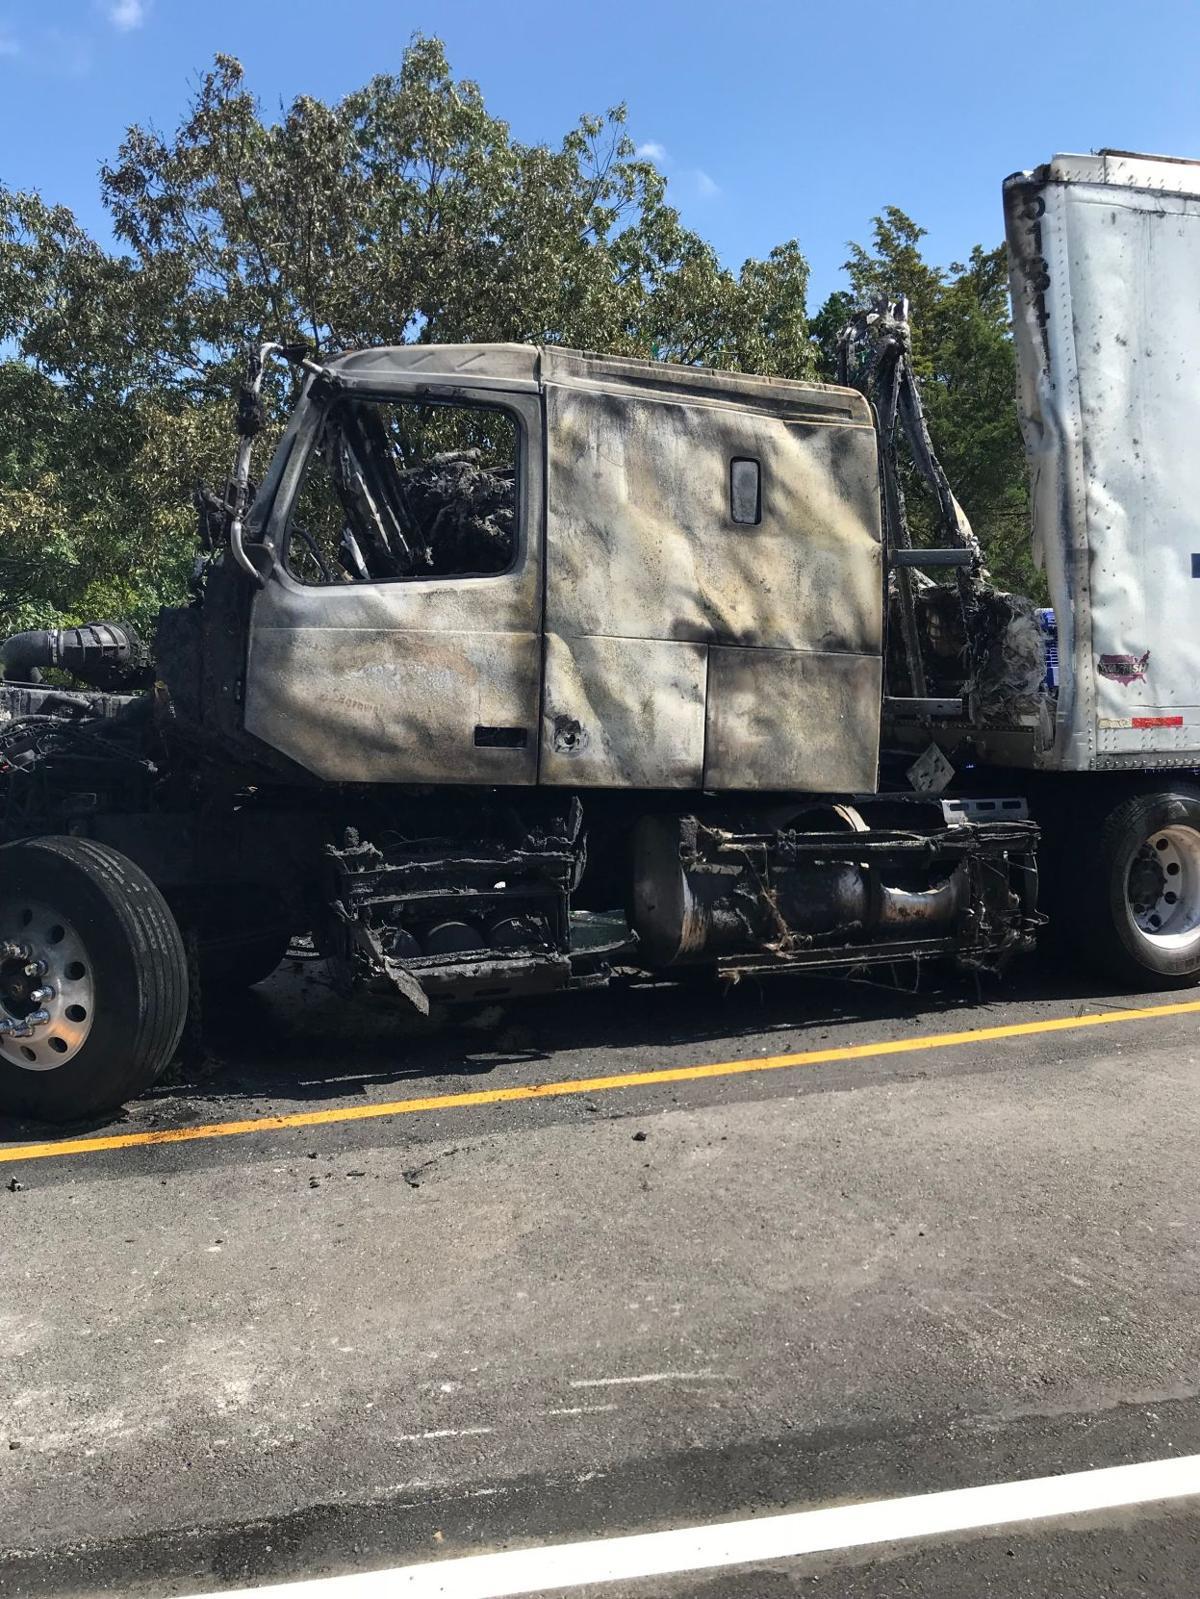 Tractor trailer crash, fire Wednesday impacting I-495/I-395 traffic